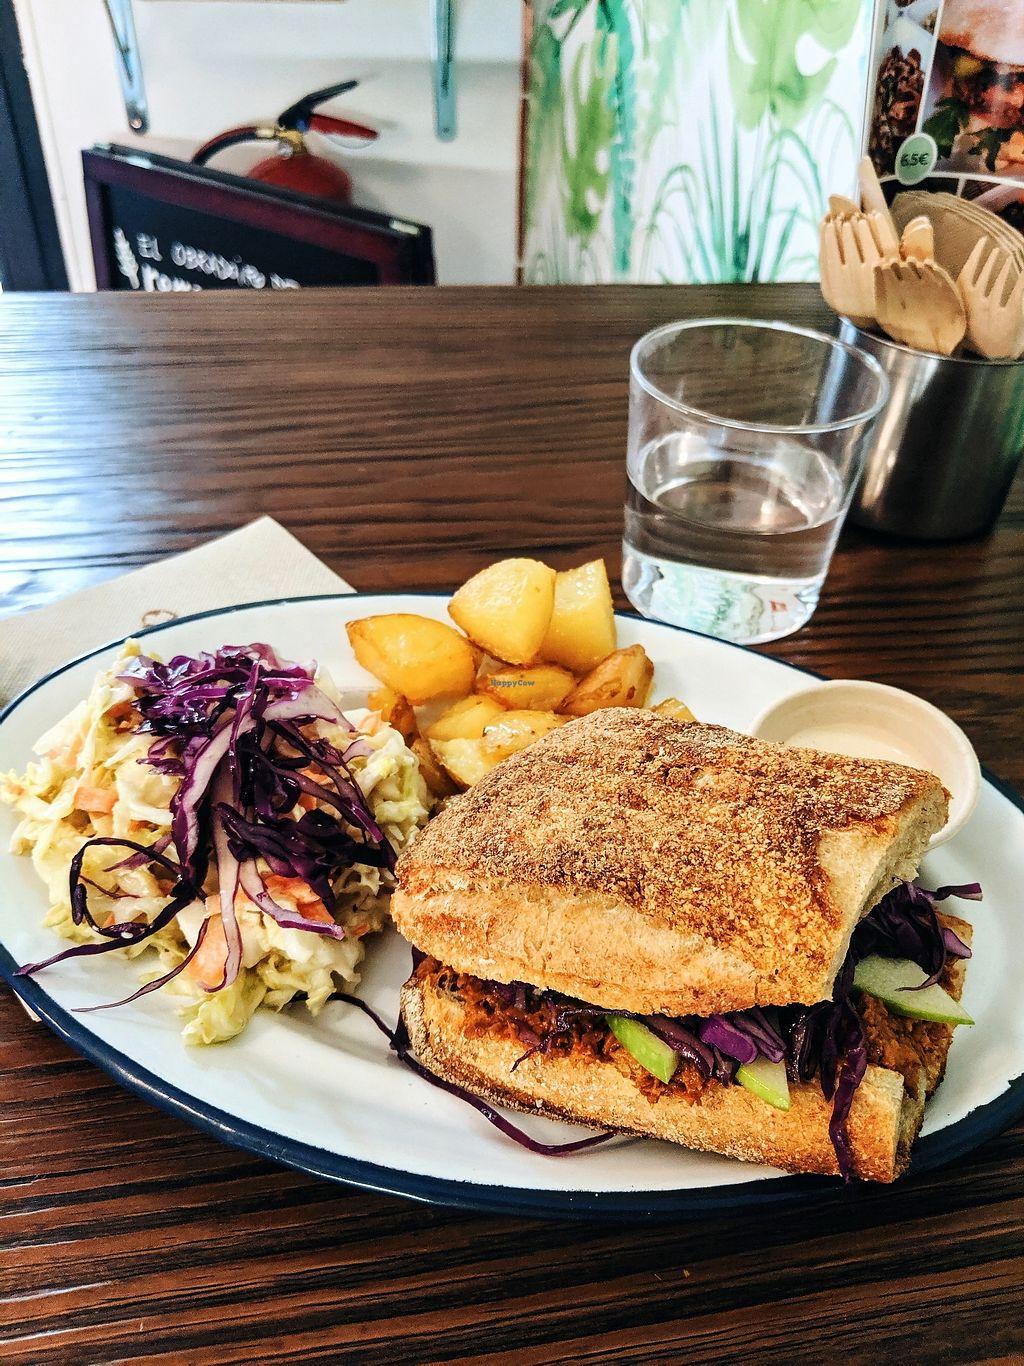 El Obradoiro De Romero Verde Madrid Restaurant Happycow